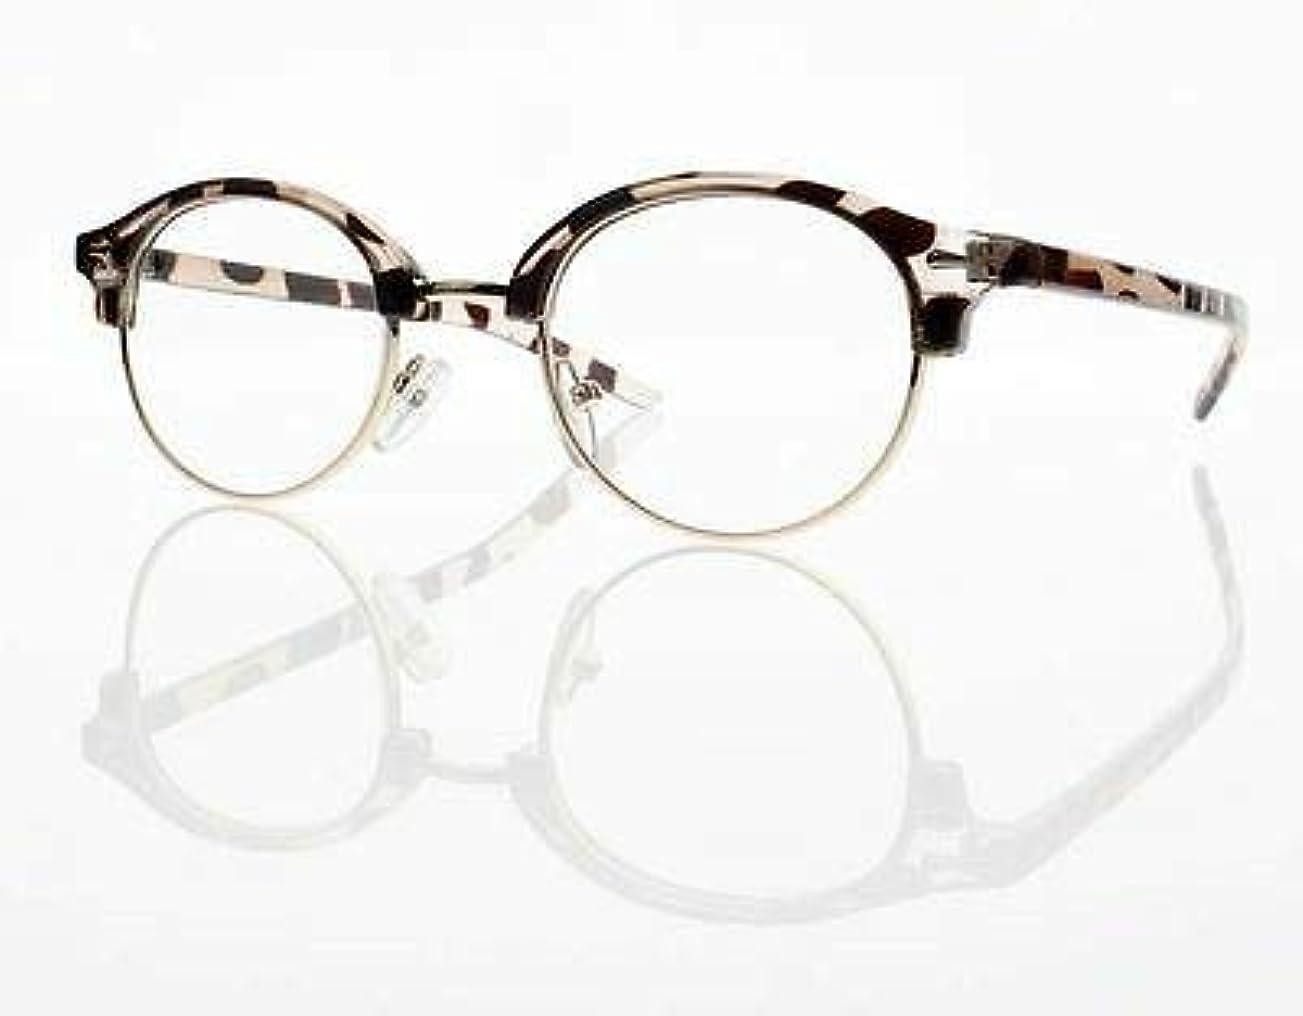 FidgetGear 新しいユニセックスレトロラウンドフレームクリアレンズ老眼鏡+1.0 + 2.0 + 3.0 + 4.0 ヒョウ